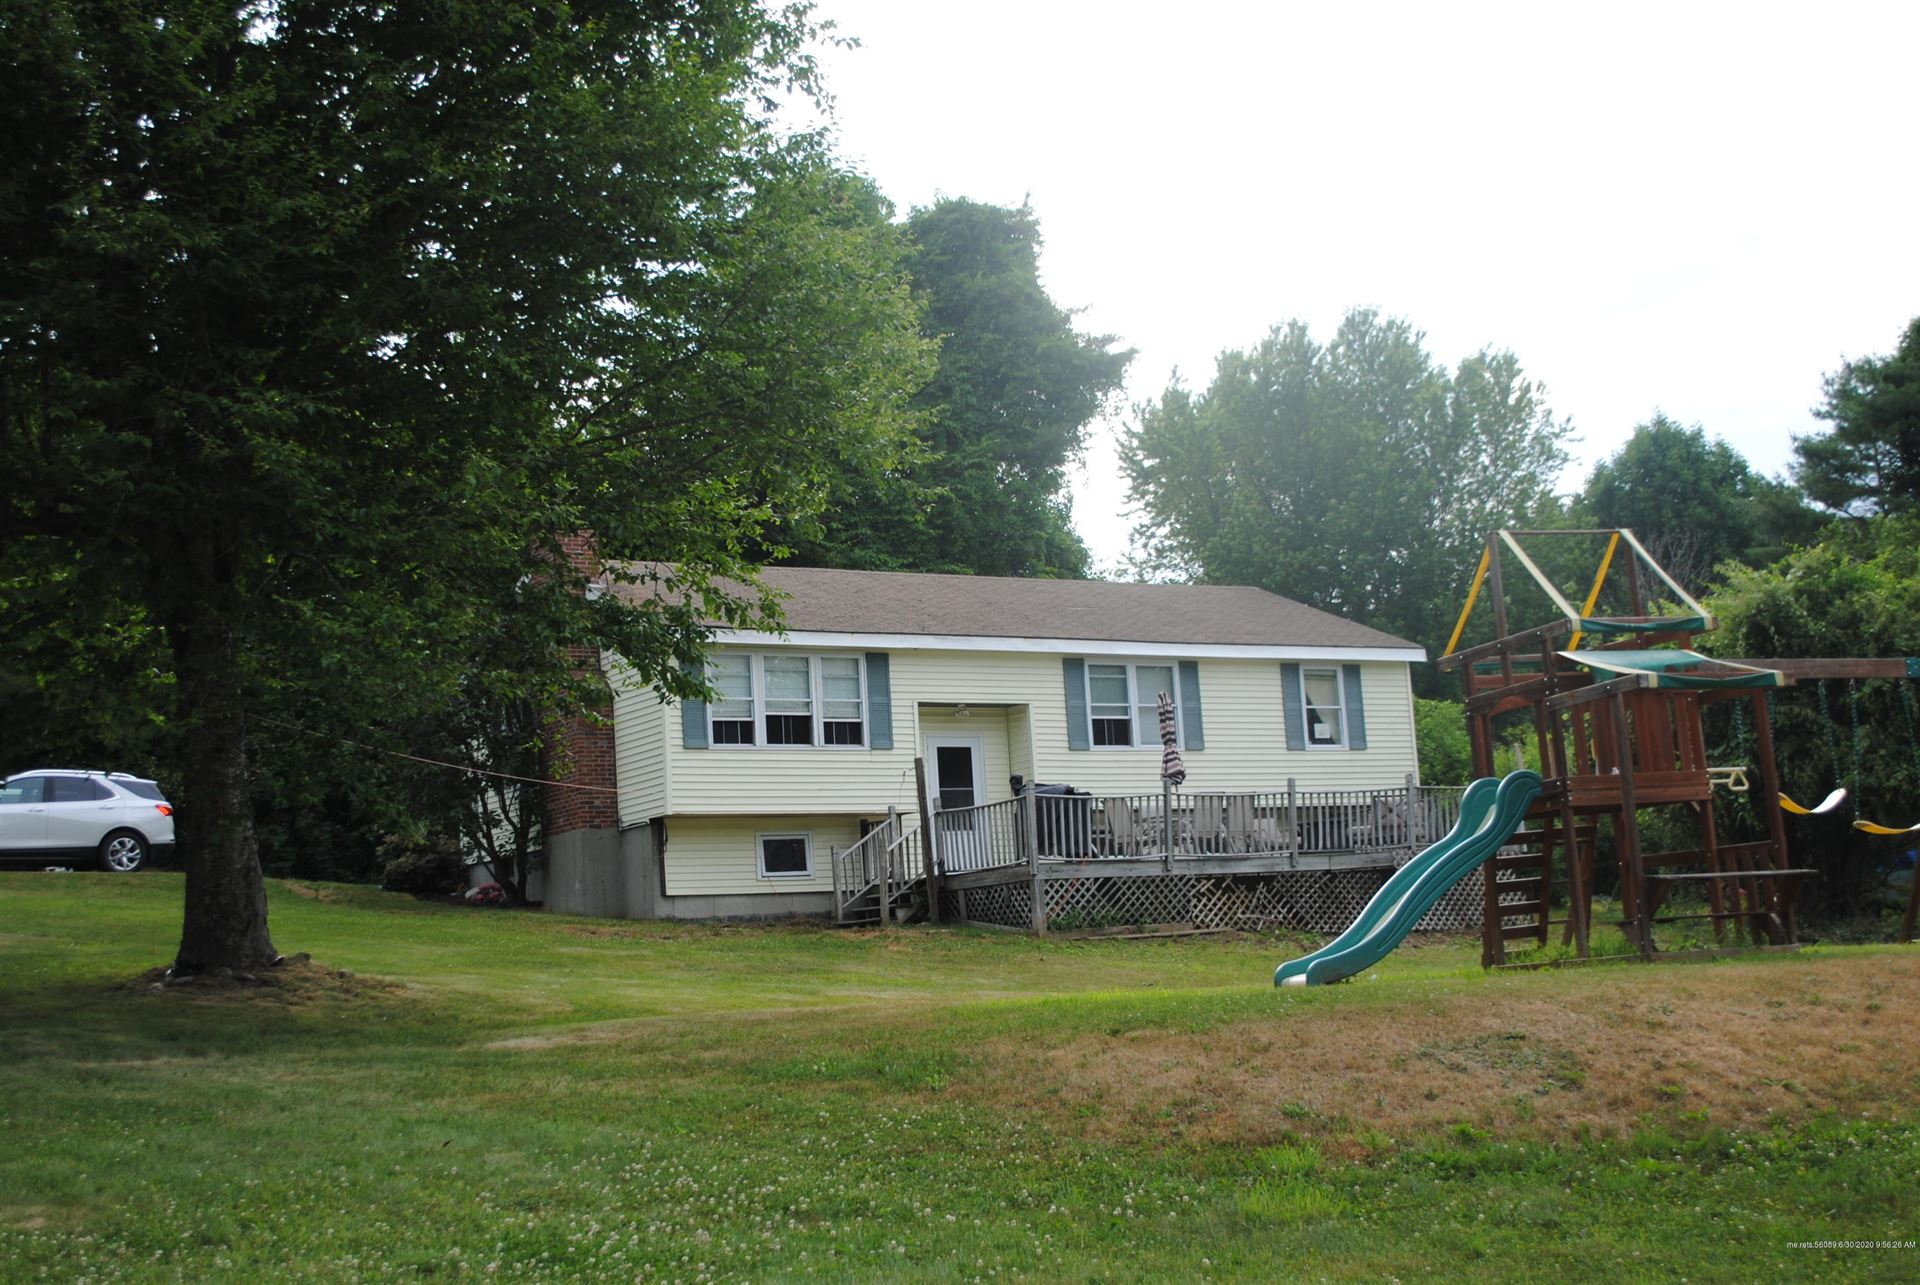 Photo of 20 Butters Hill Terrace, Winthrop, ME 04364 (MLS # 1458344)